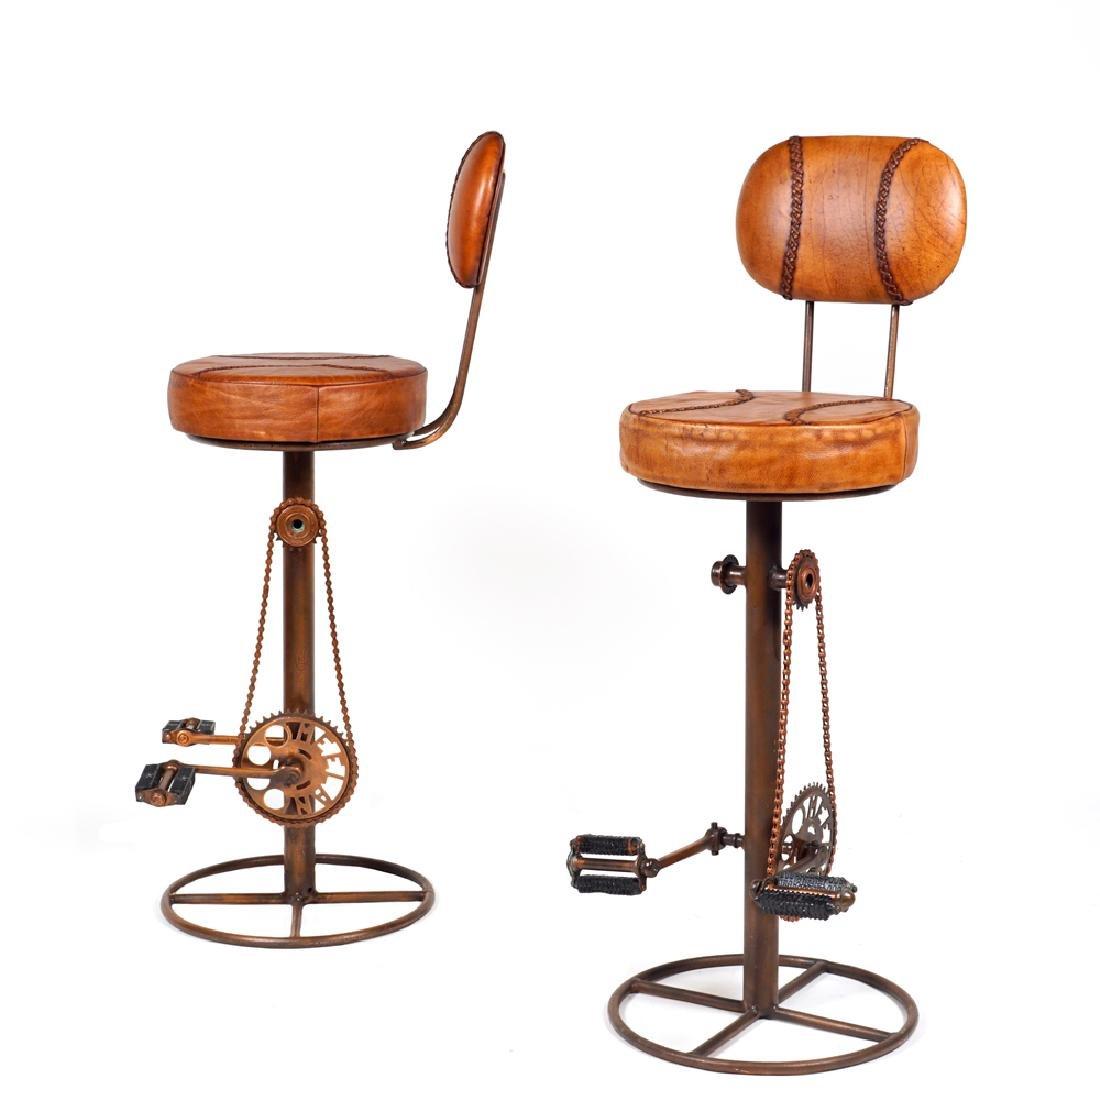 Pair of bar cycle stools 20th century 116x42x42 cm.